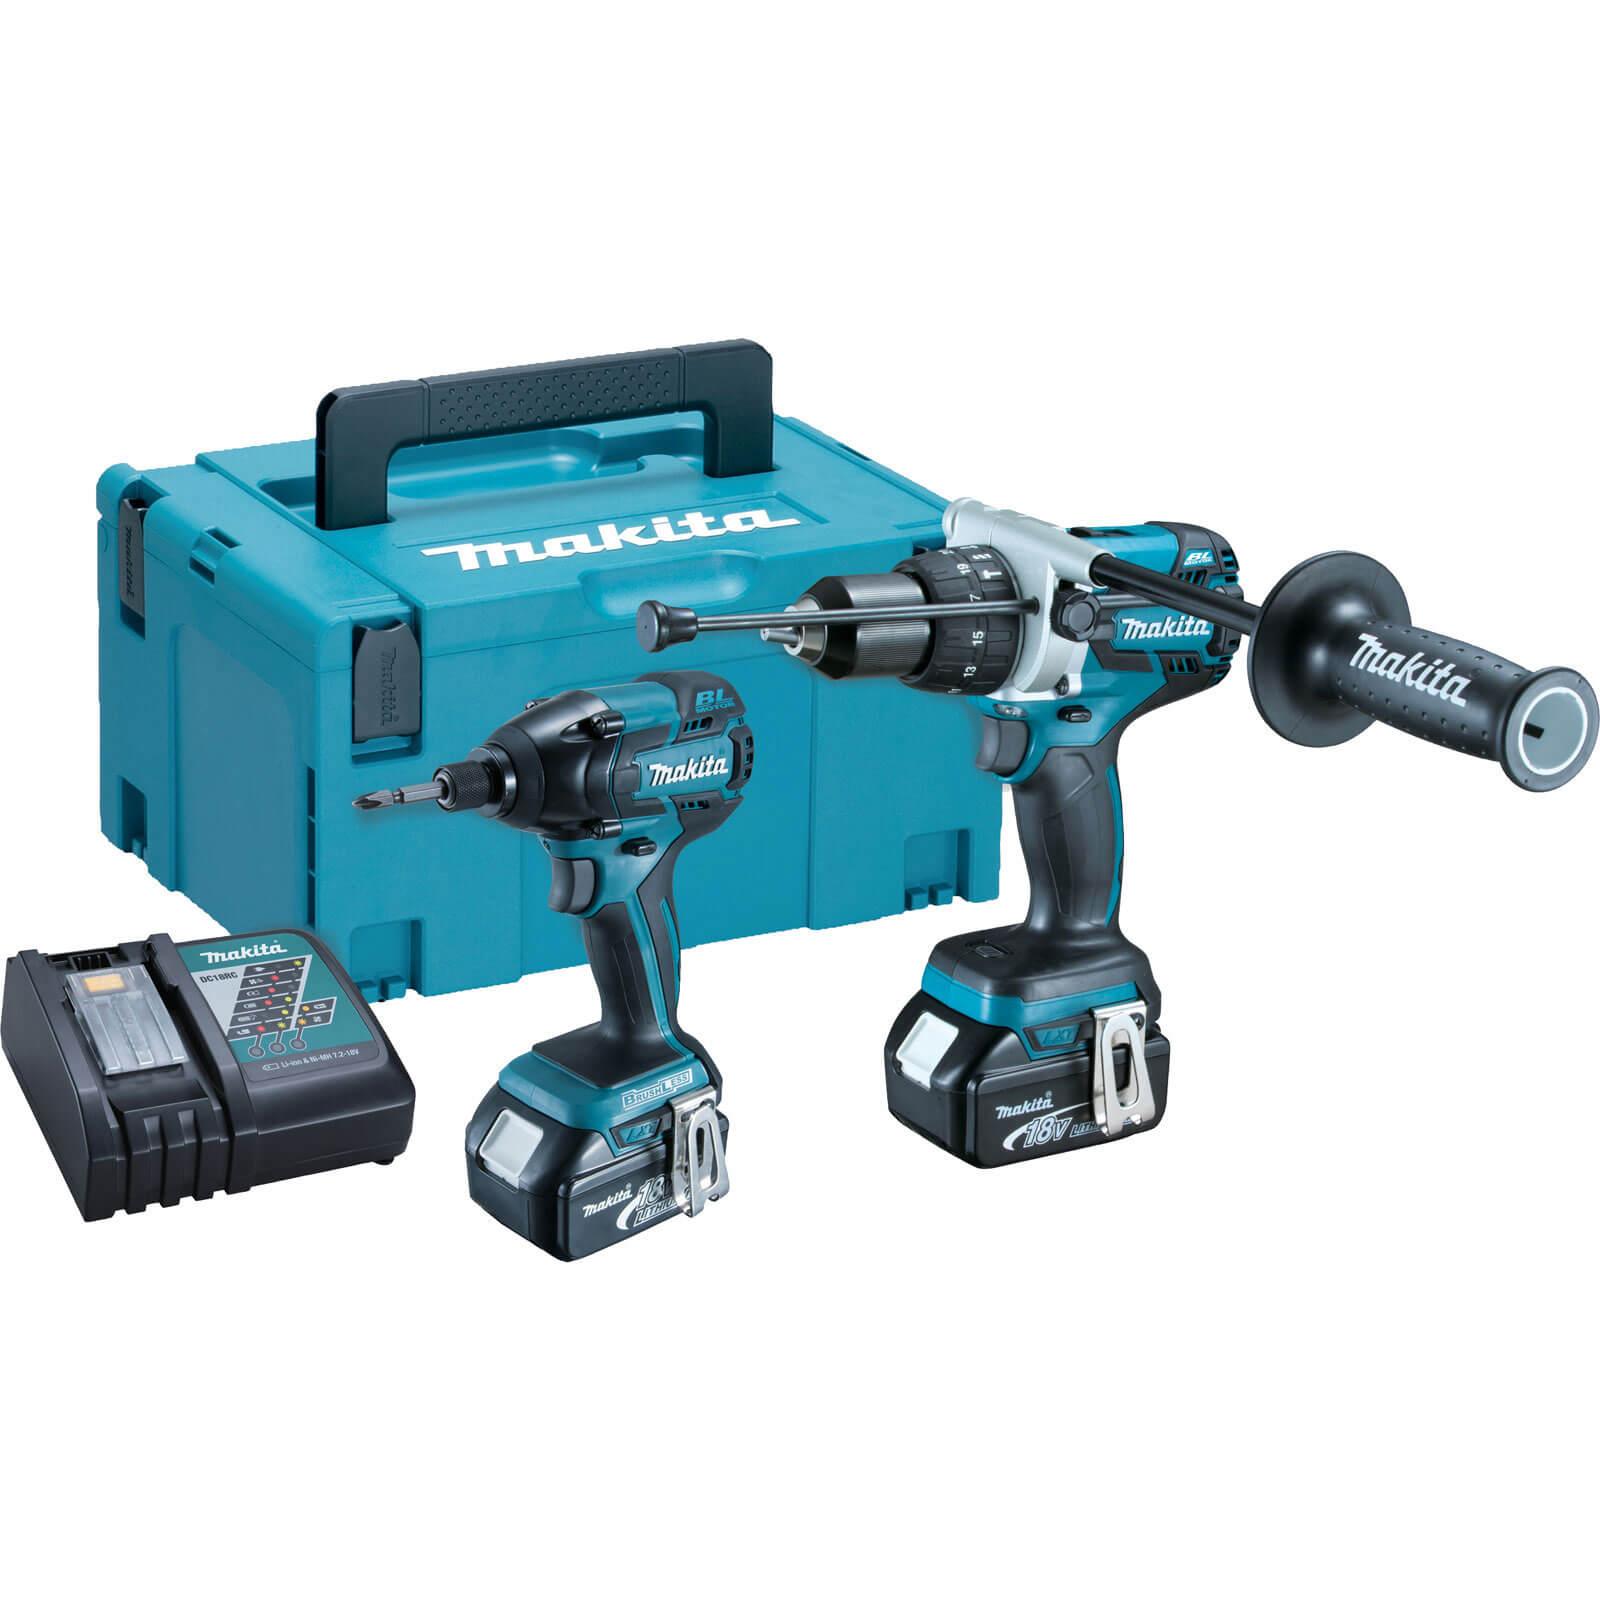 Cordless power tool kits uk modern